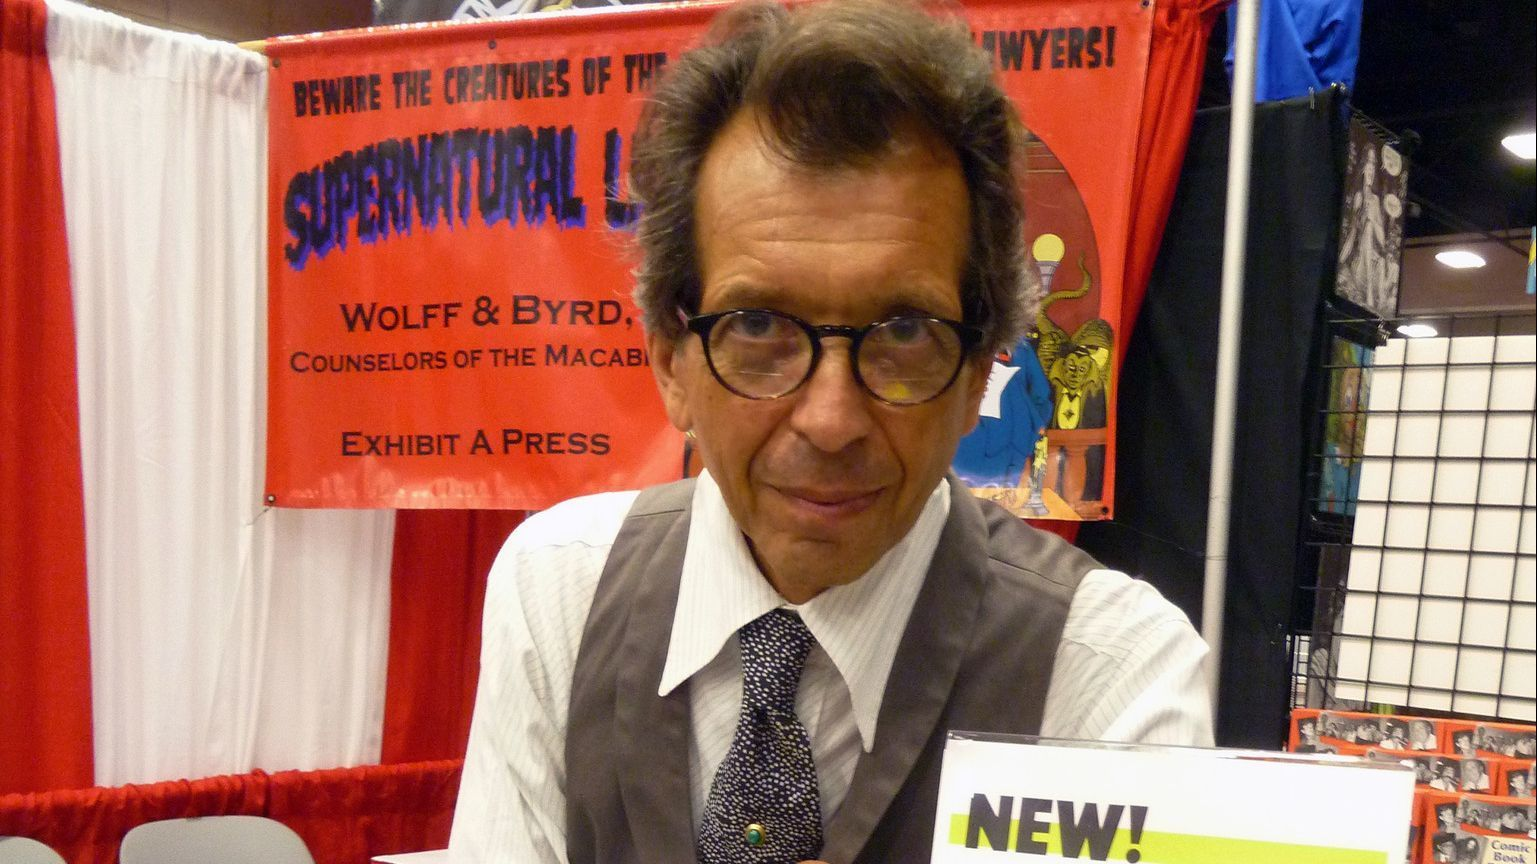 Batton Lash, comics author and Comic-Con mainstay, 1953-2019